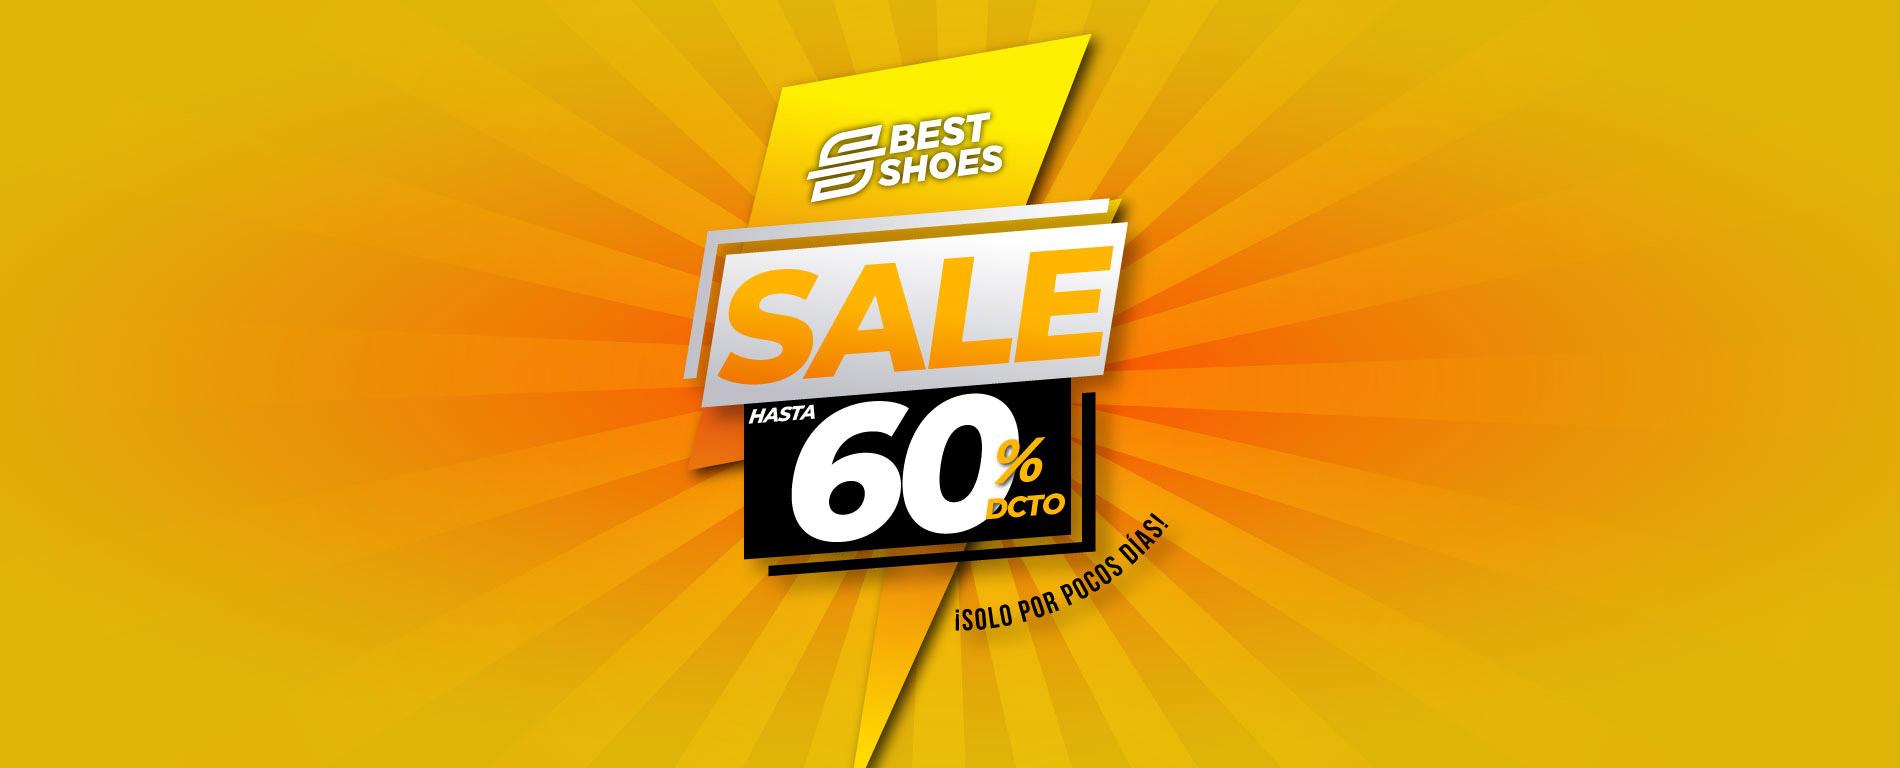 Sale-60Off-Agosto_BS